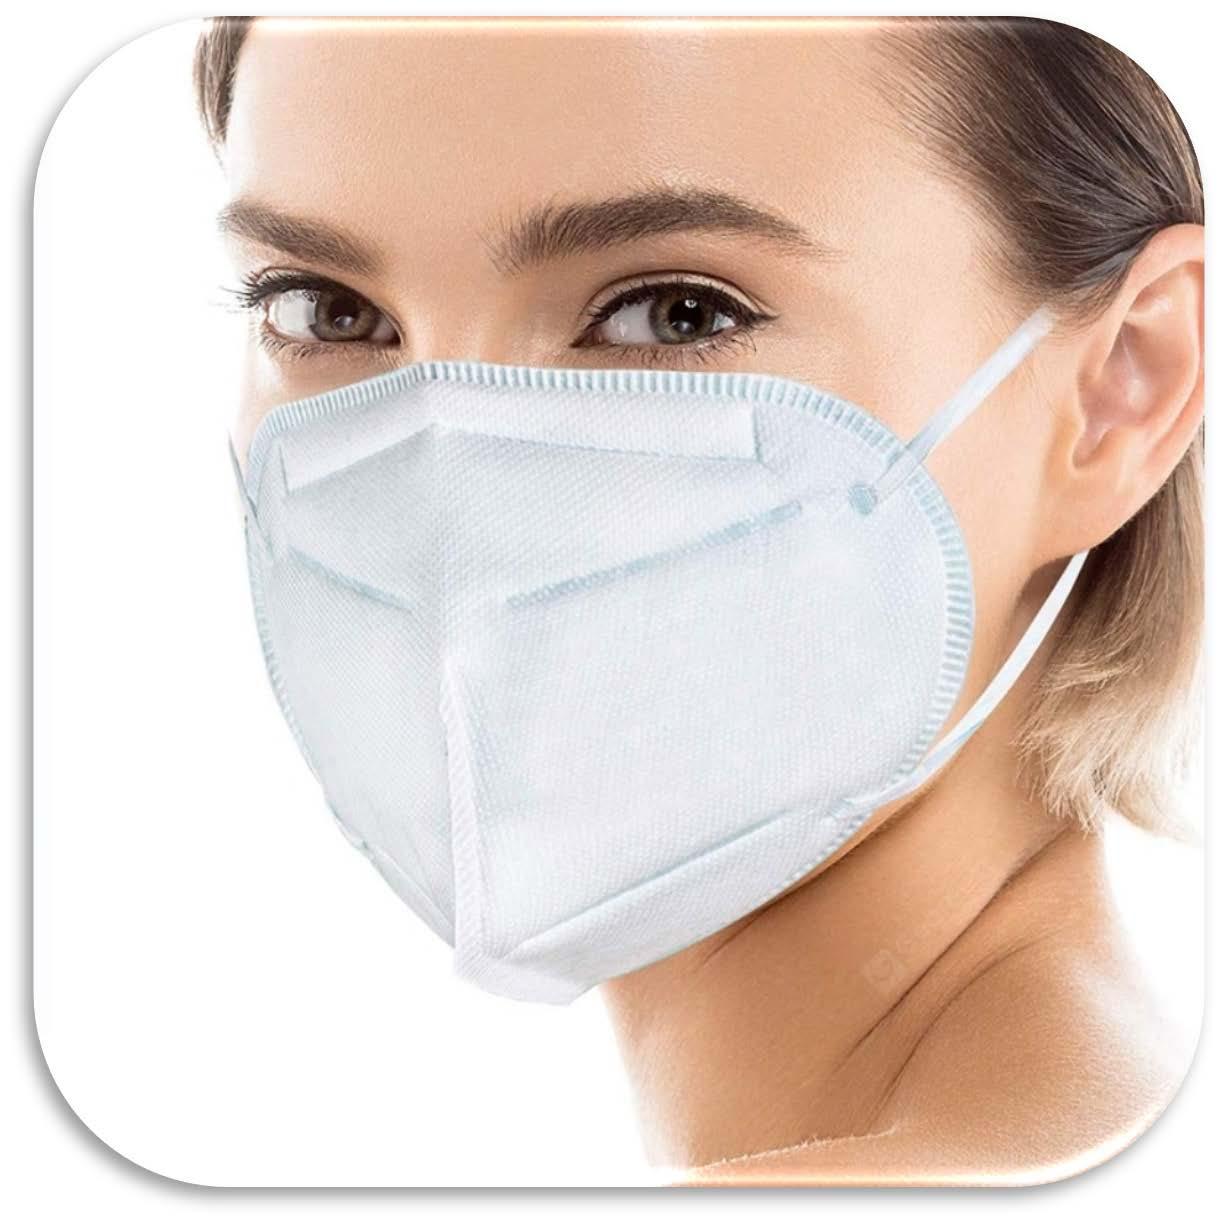 KN95 & FFP2 Disposable Face Mask's